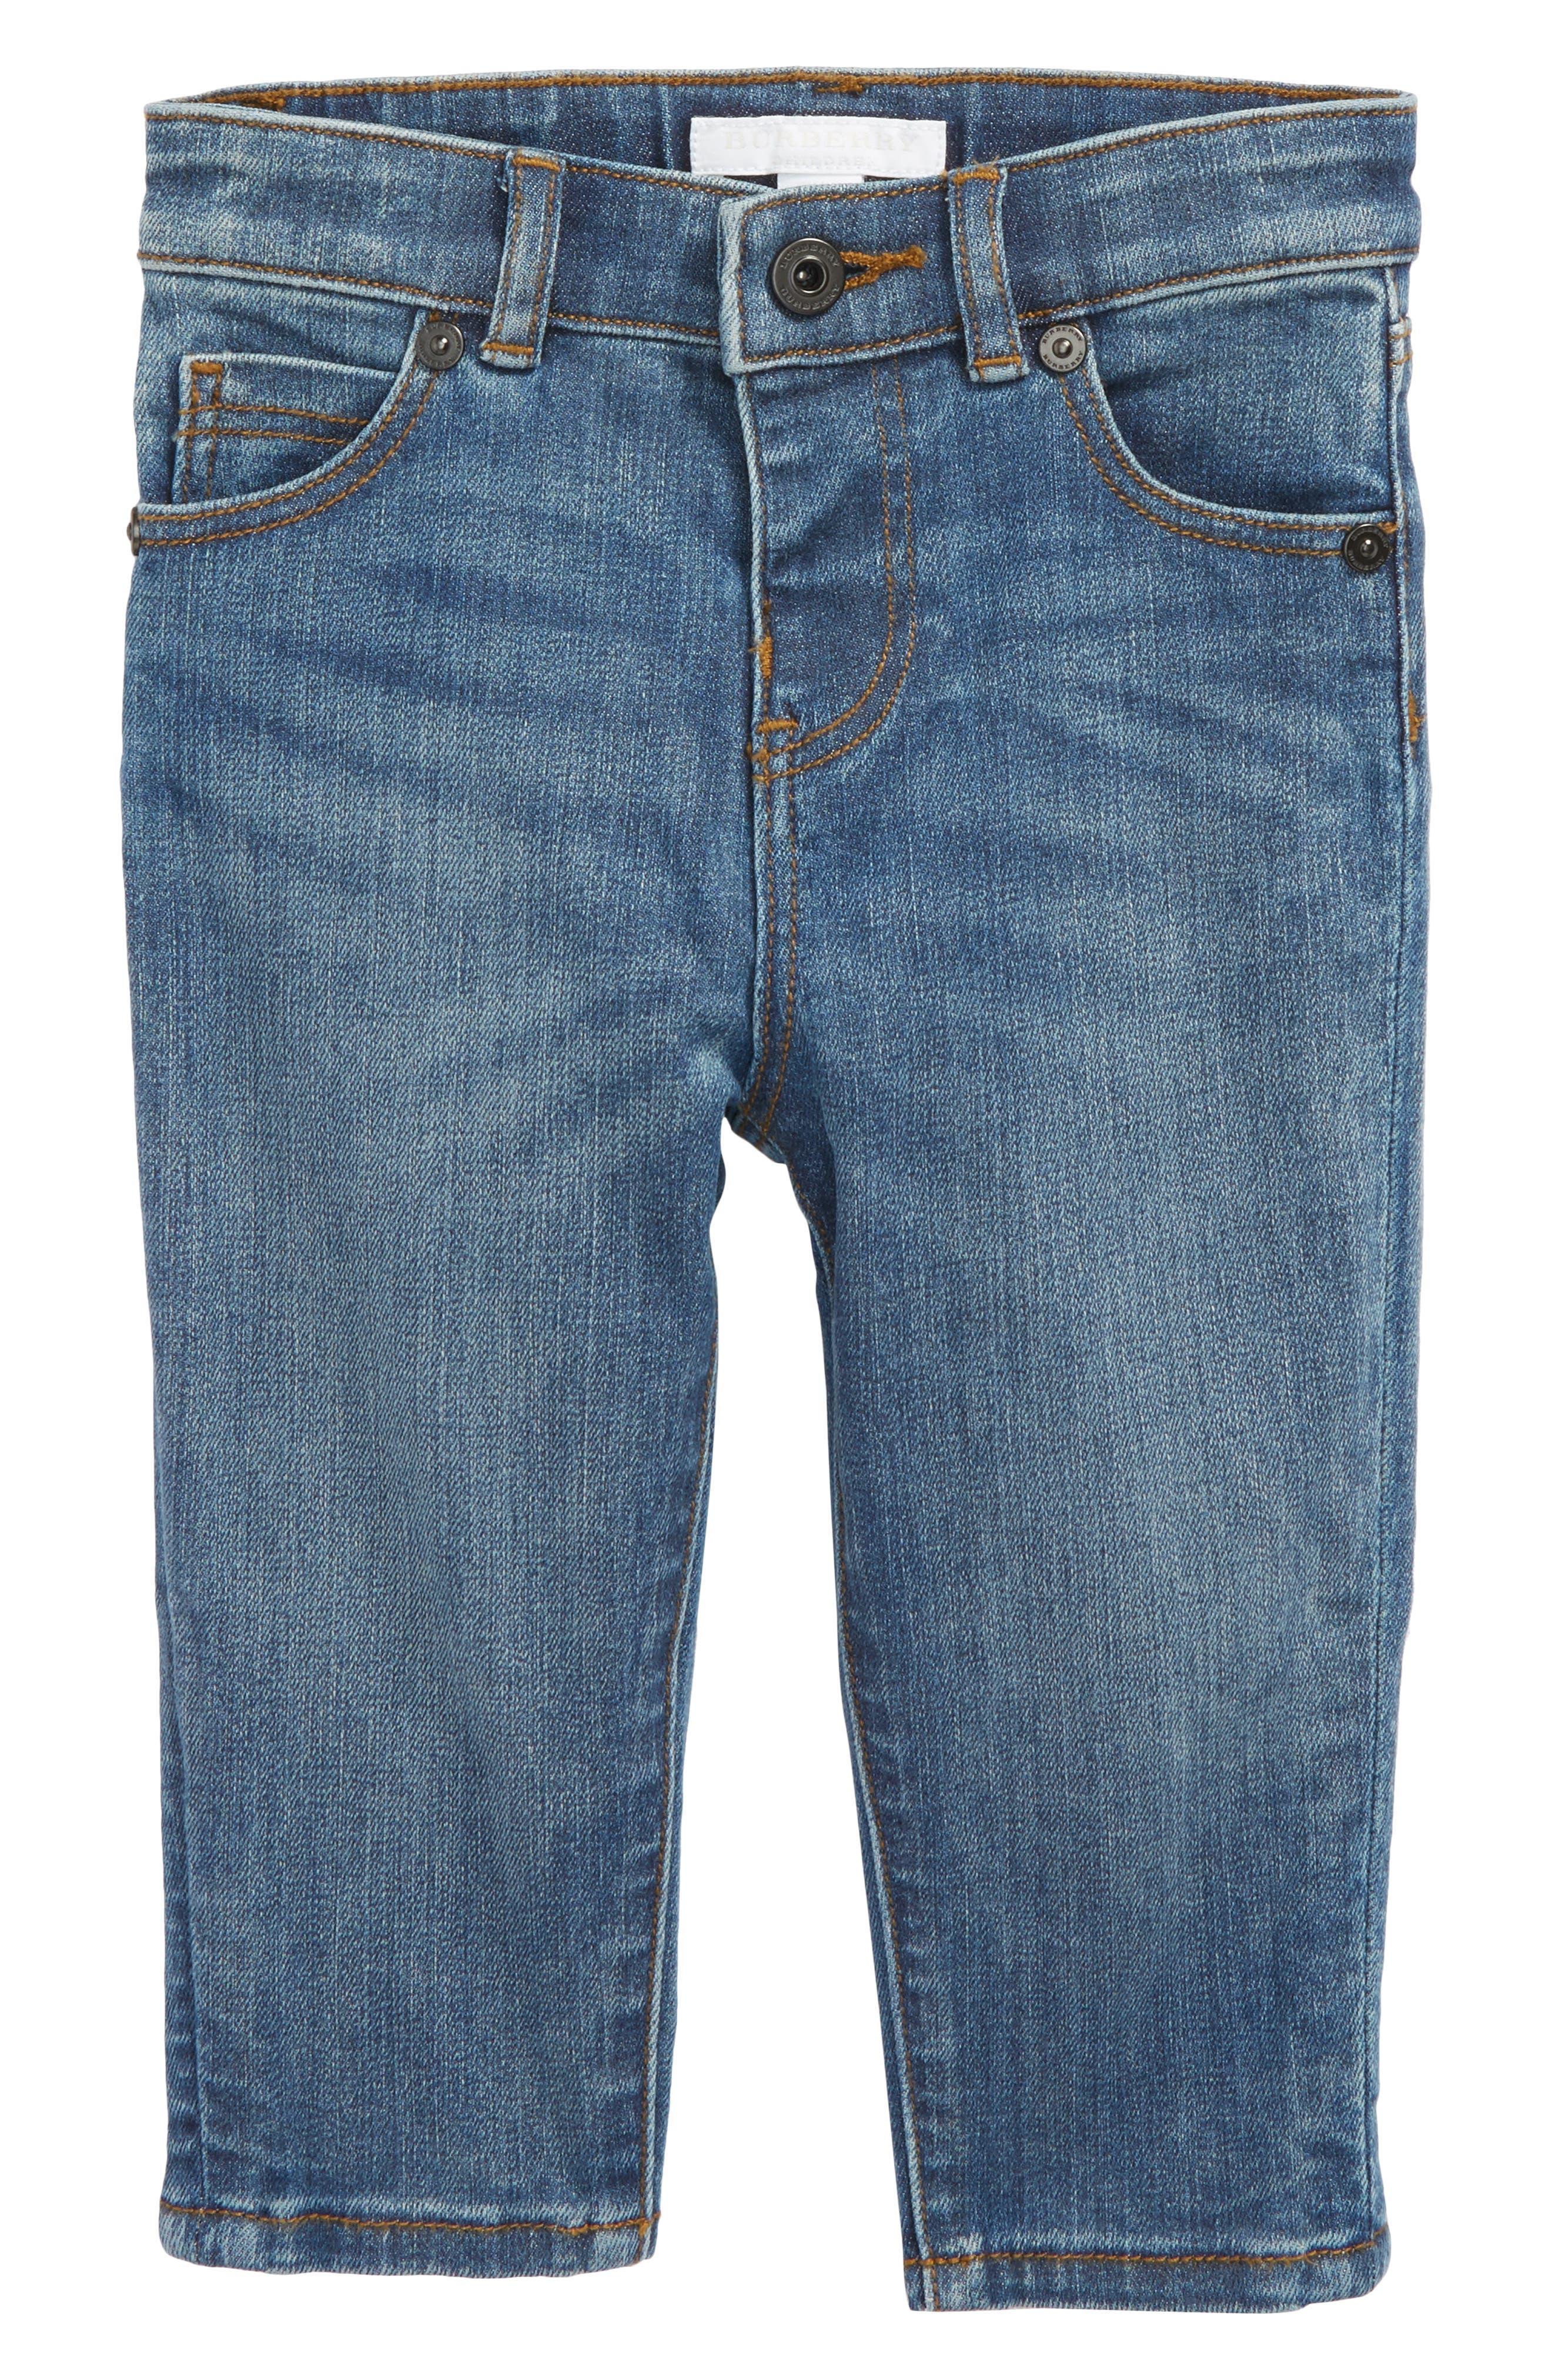 Skinny Jeans,                             Main thumbnail 1, color,                             Medium Indigo